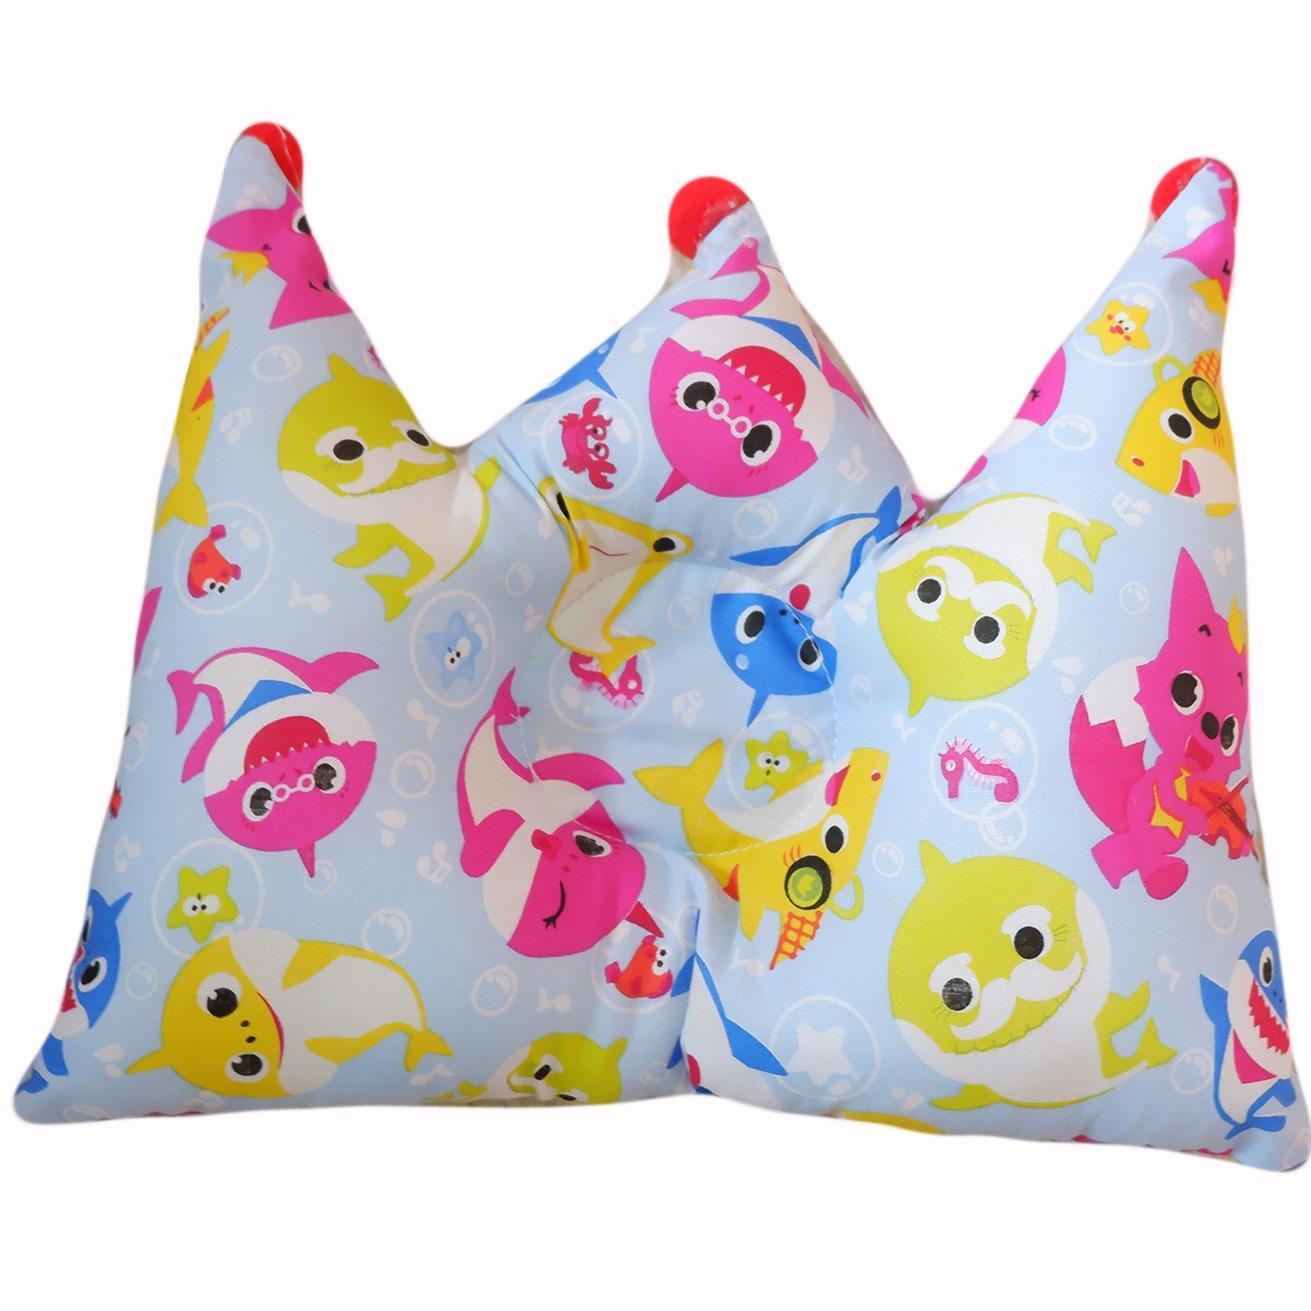 Buy Sell Cheapest S4sassythrow Sarung Bantal Best Quality Product Olus Pillow Sarban Mahkota Bayi